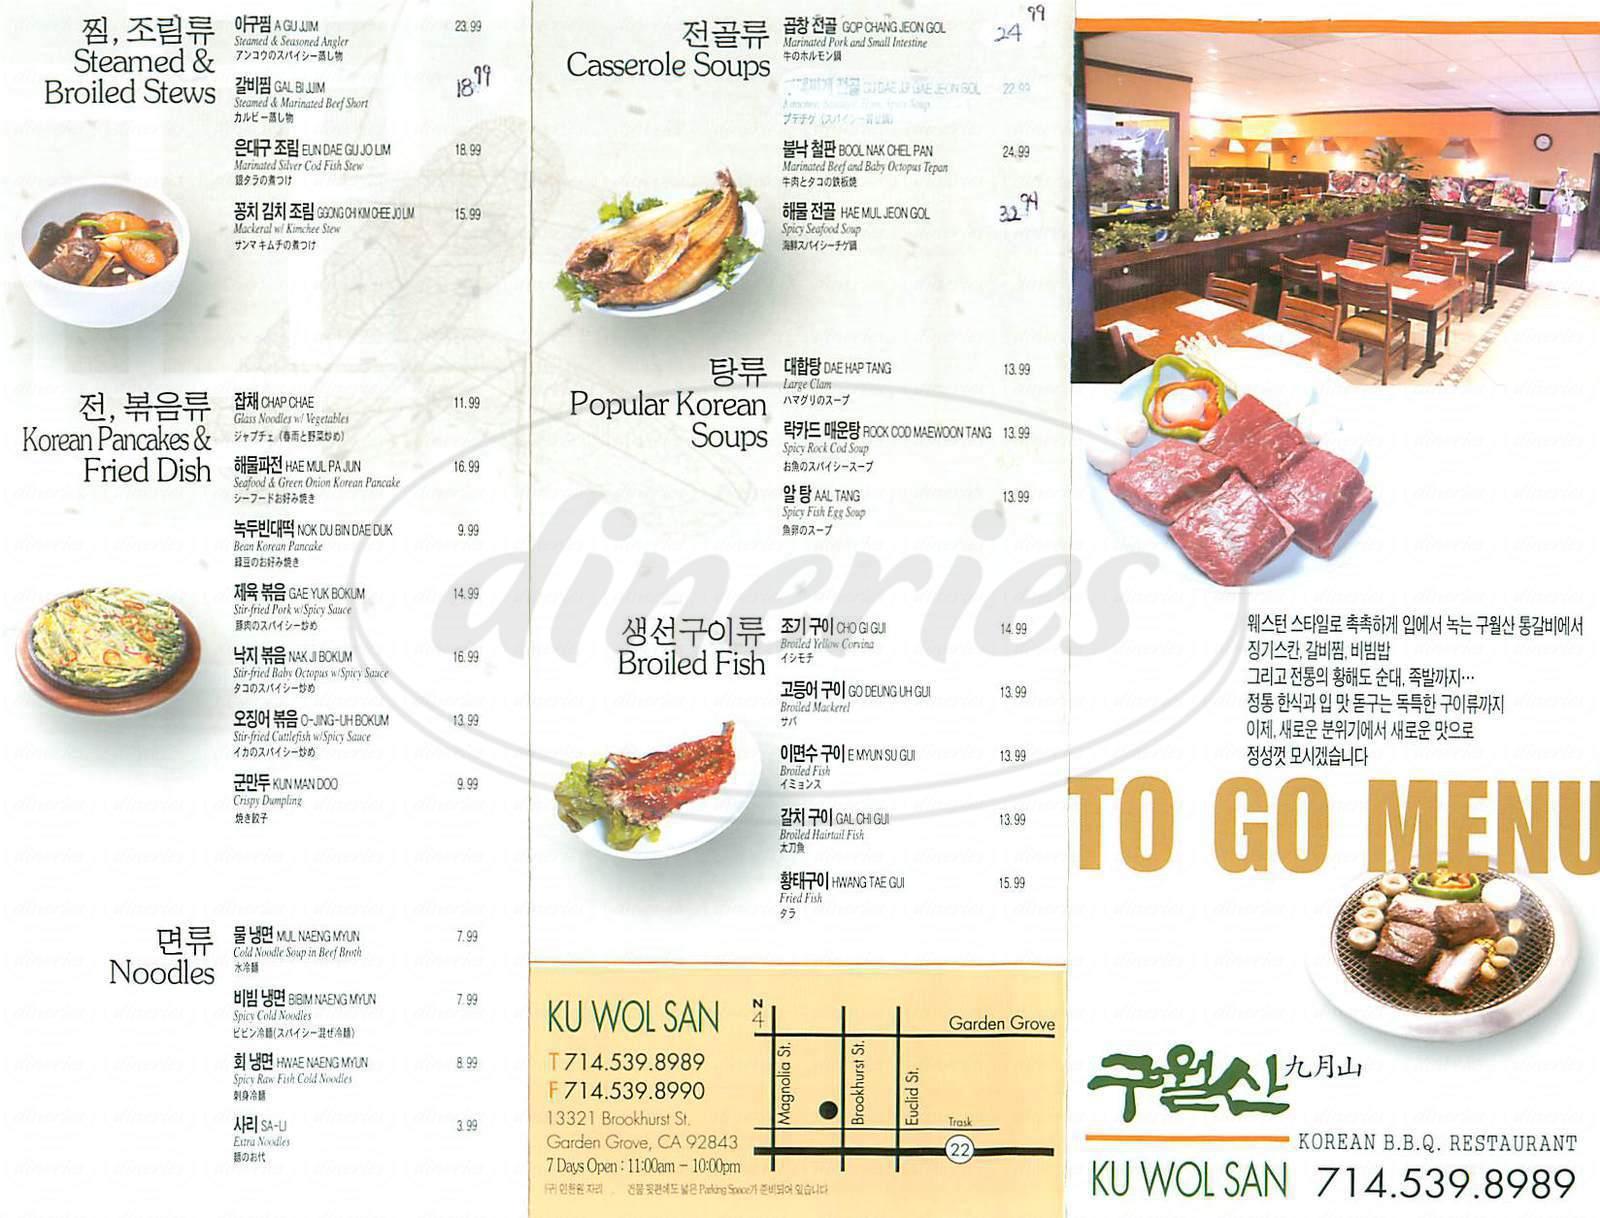 menu for Ku Wol San